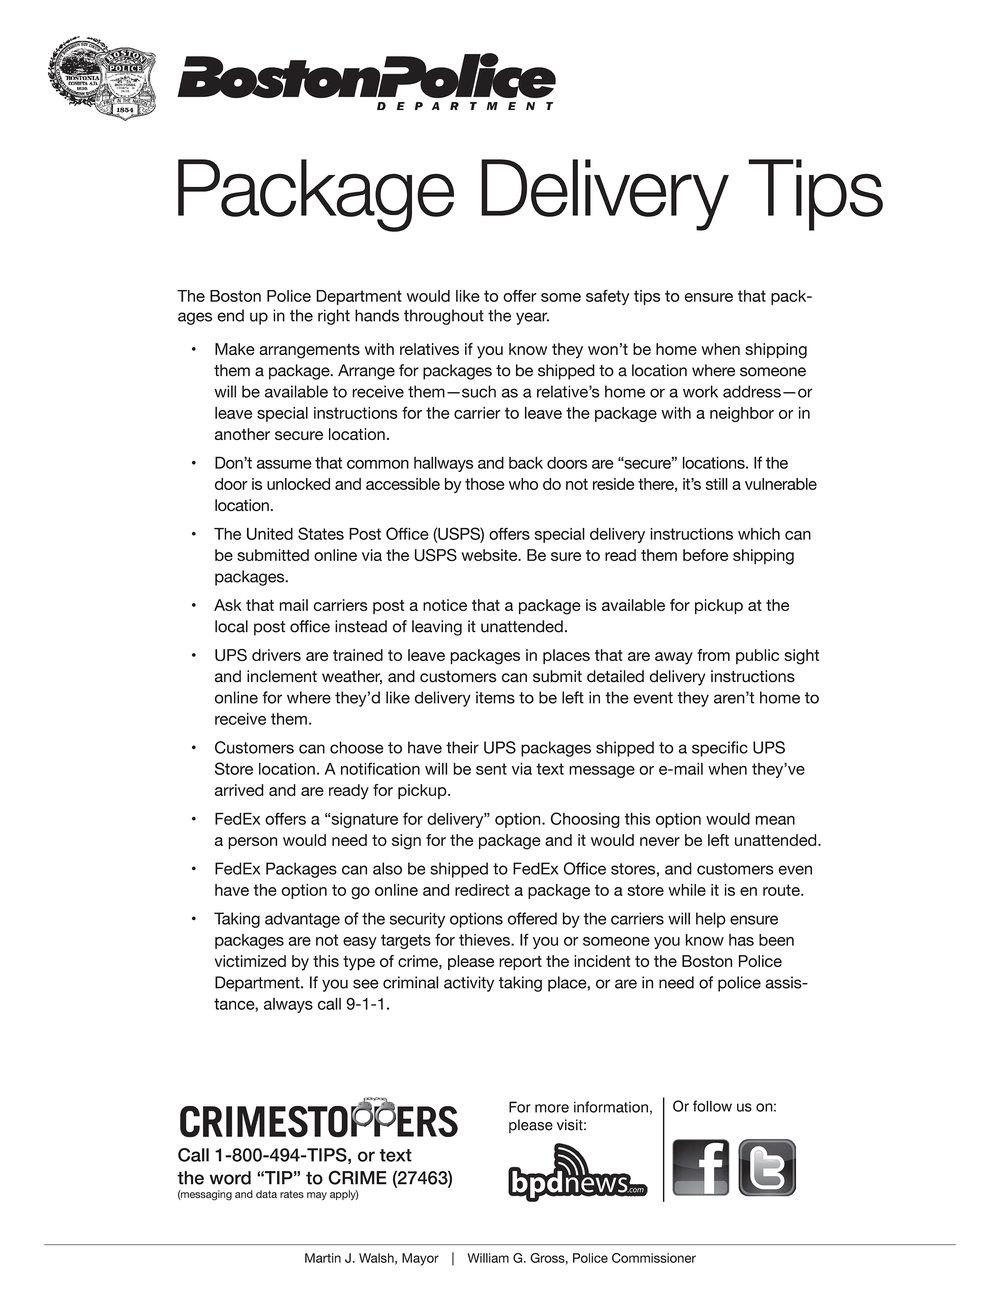 BPD Community Advisory: Holiday Package Theft